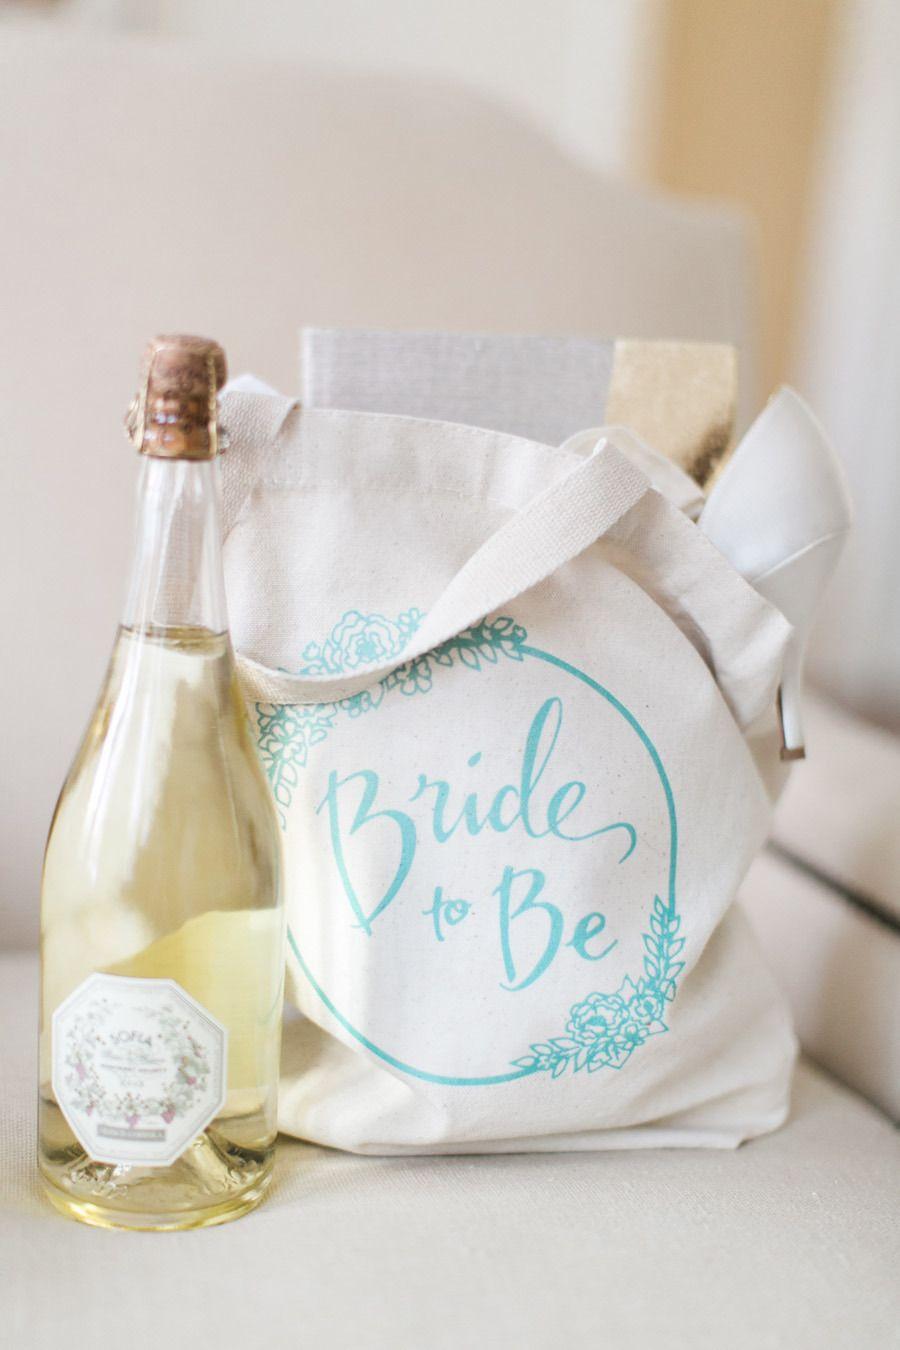 Wedding Dress Shopping Survival Kit | Survival kits, Wedding dress ...